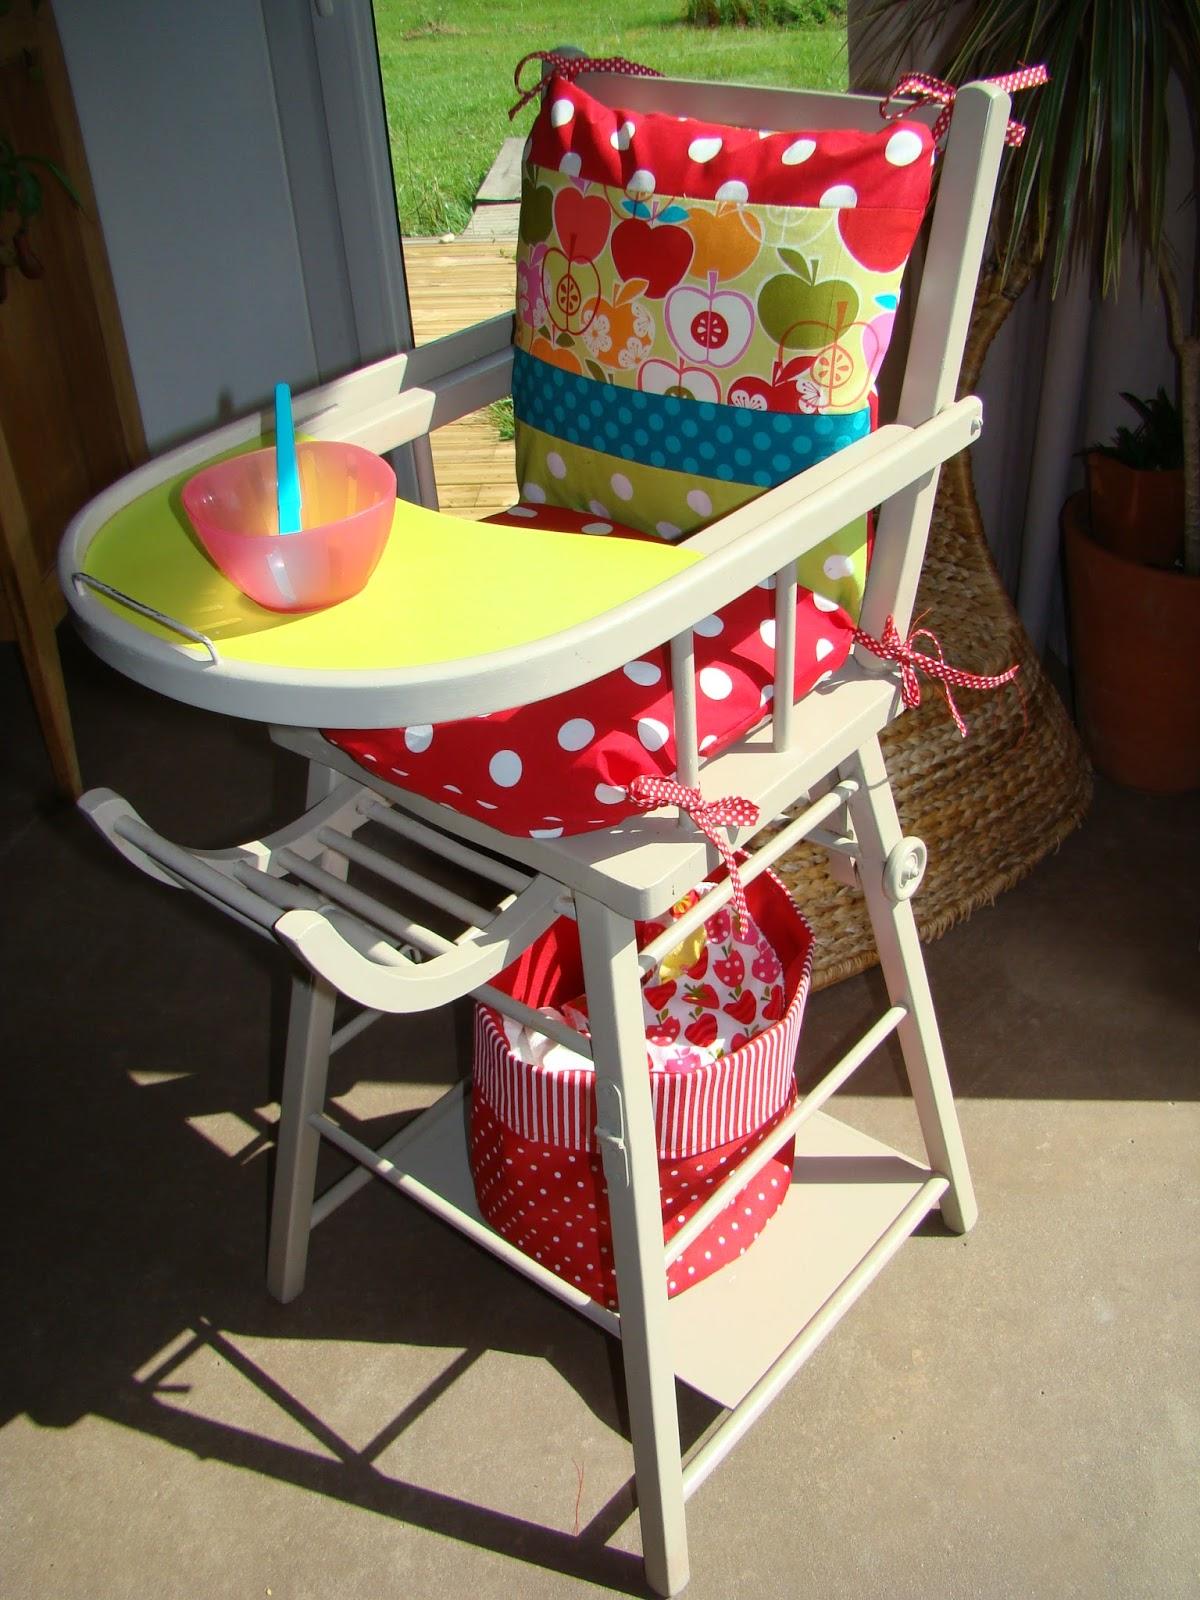 La belette bidouille relooking de ma chaise haute - Customiser une chaise ...